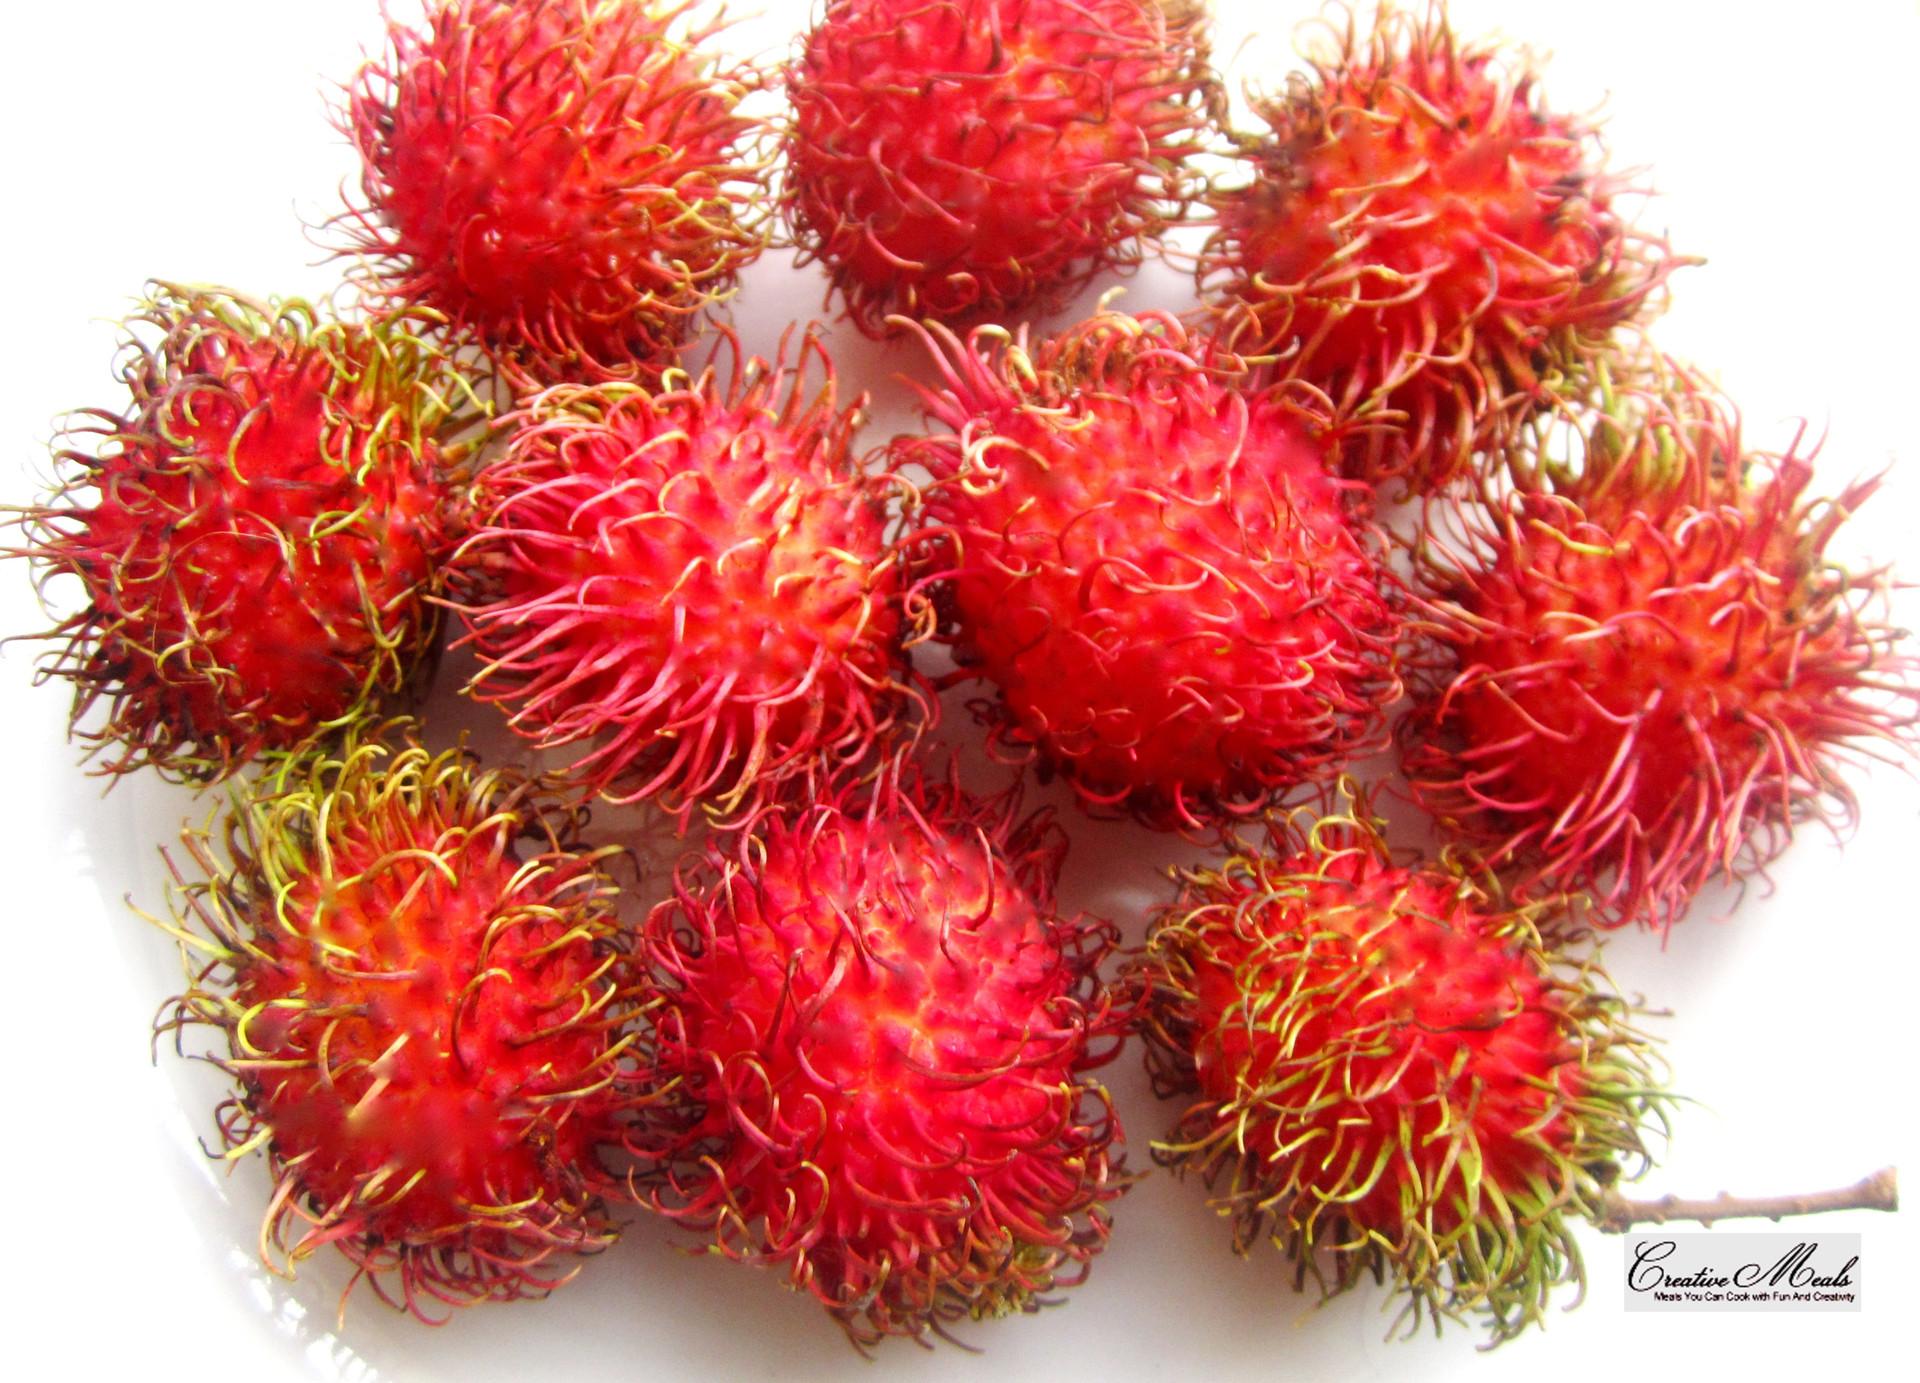 best of malaysia's tropical fruits | erasmus blog kuala lumpur, malaysia